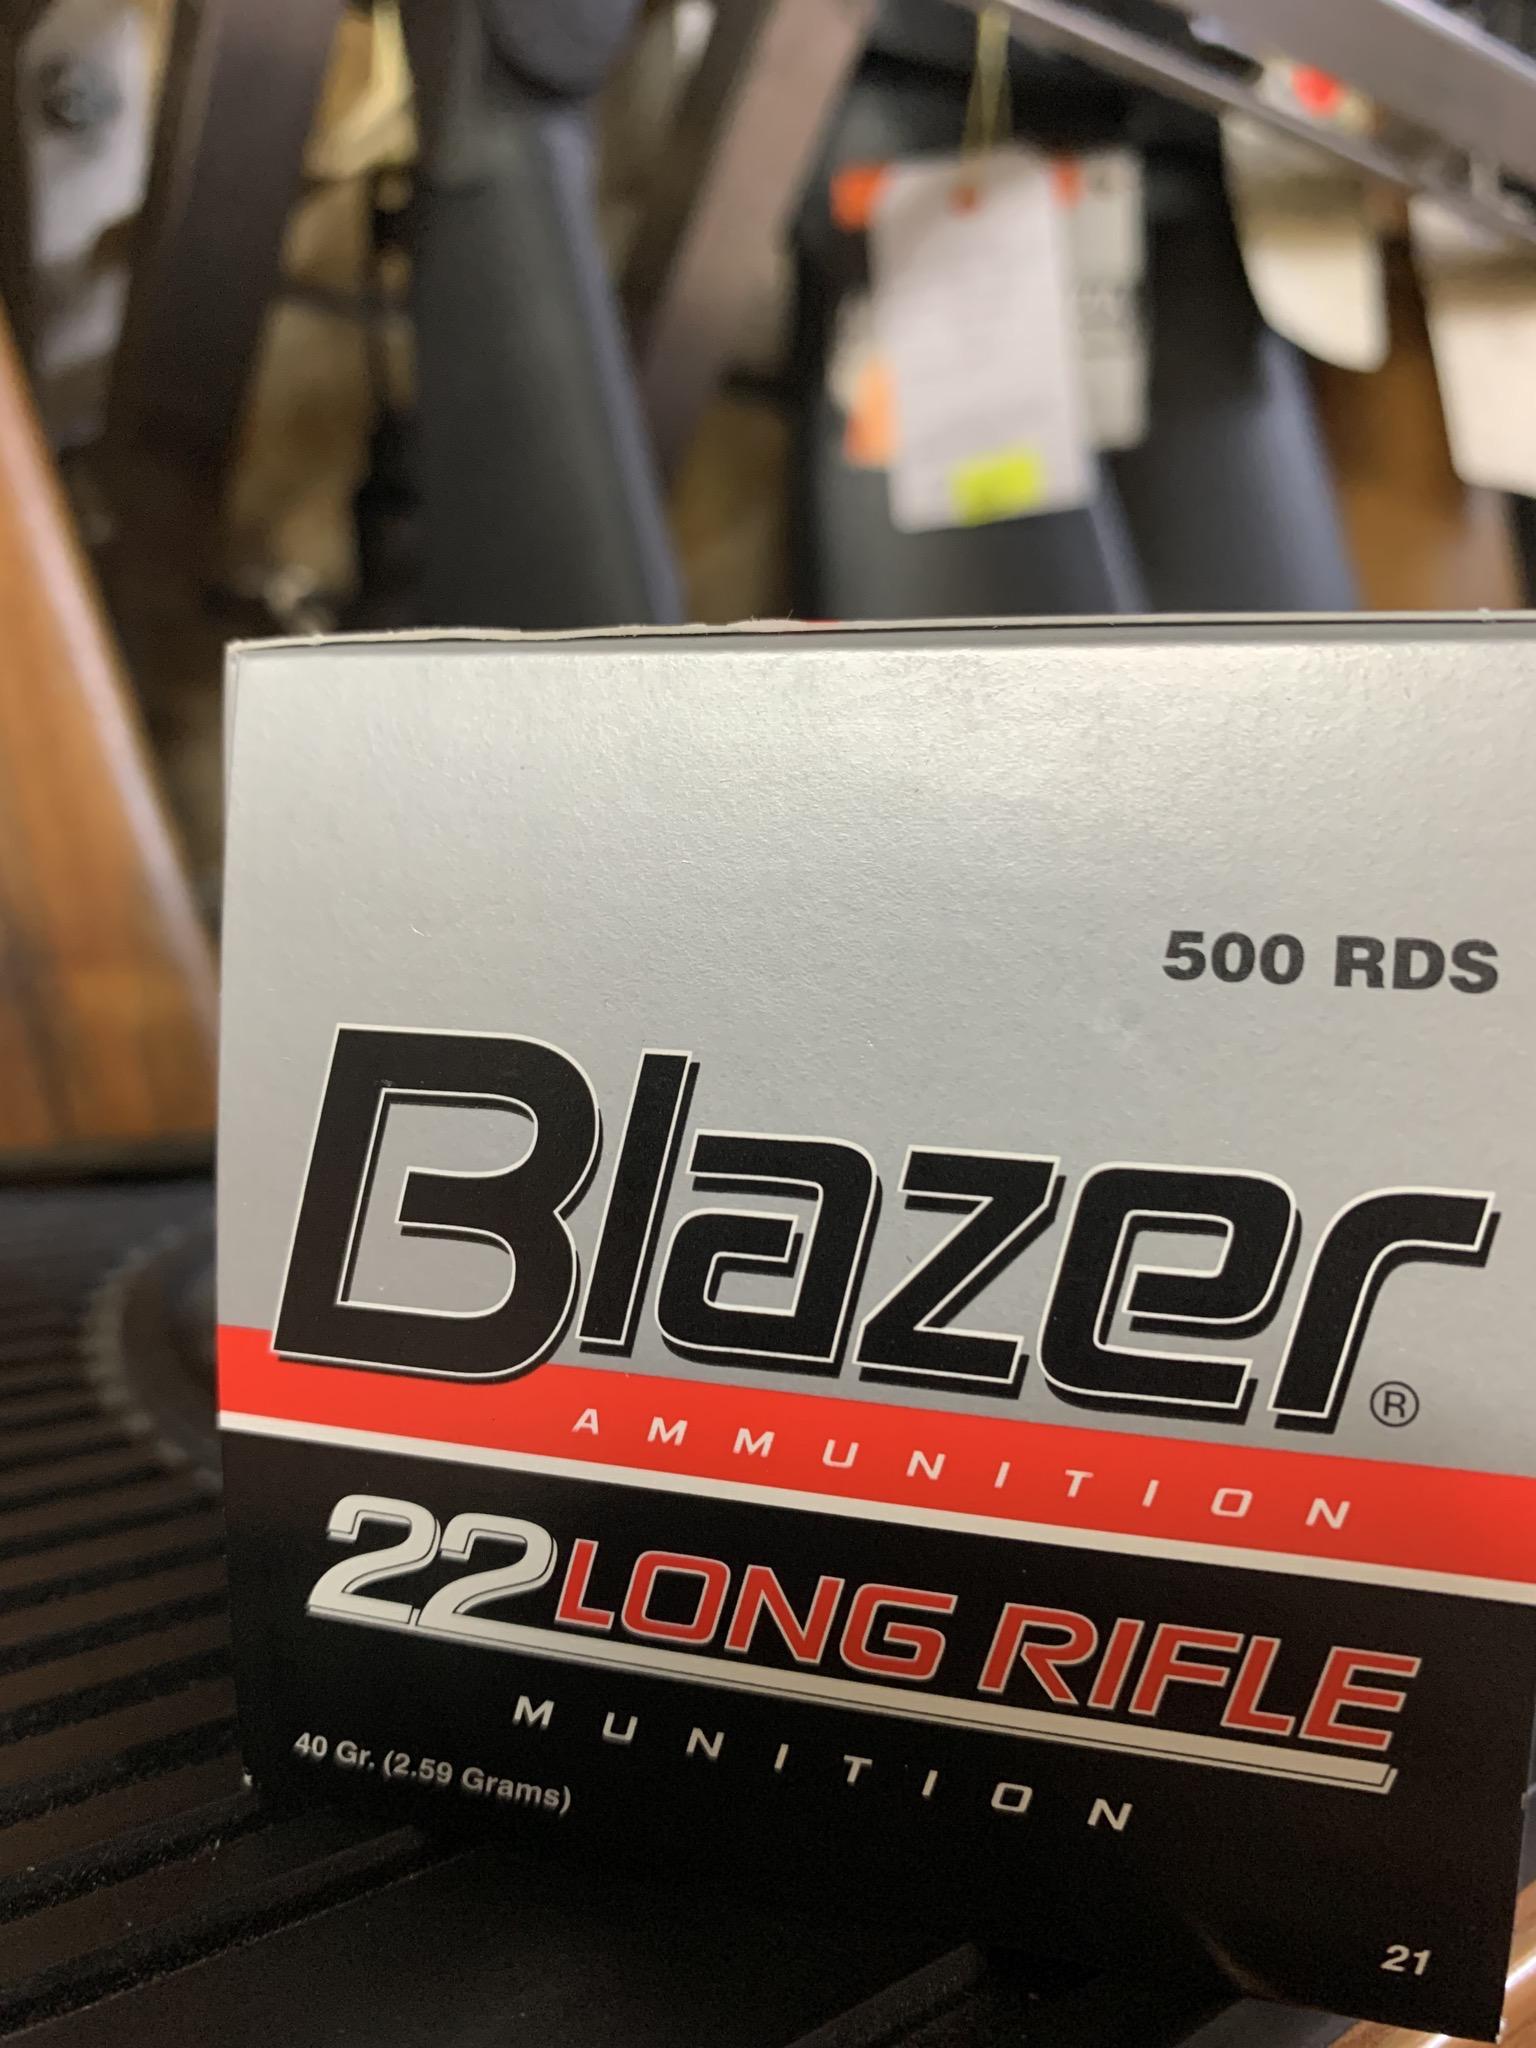 Blazer 22 LR bulk pack ammunition (500 rounds)